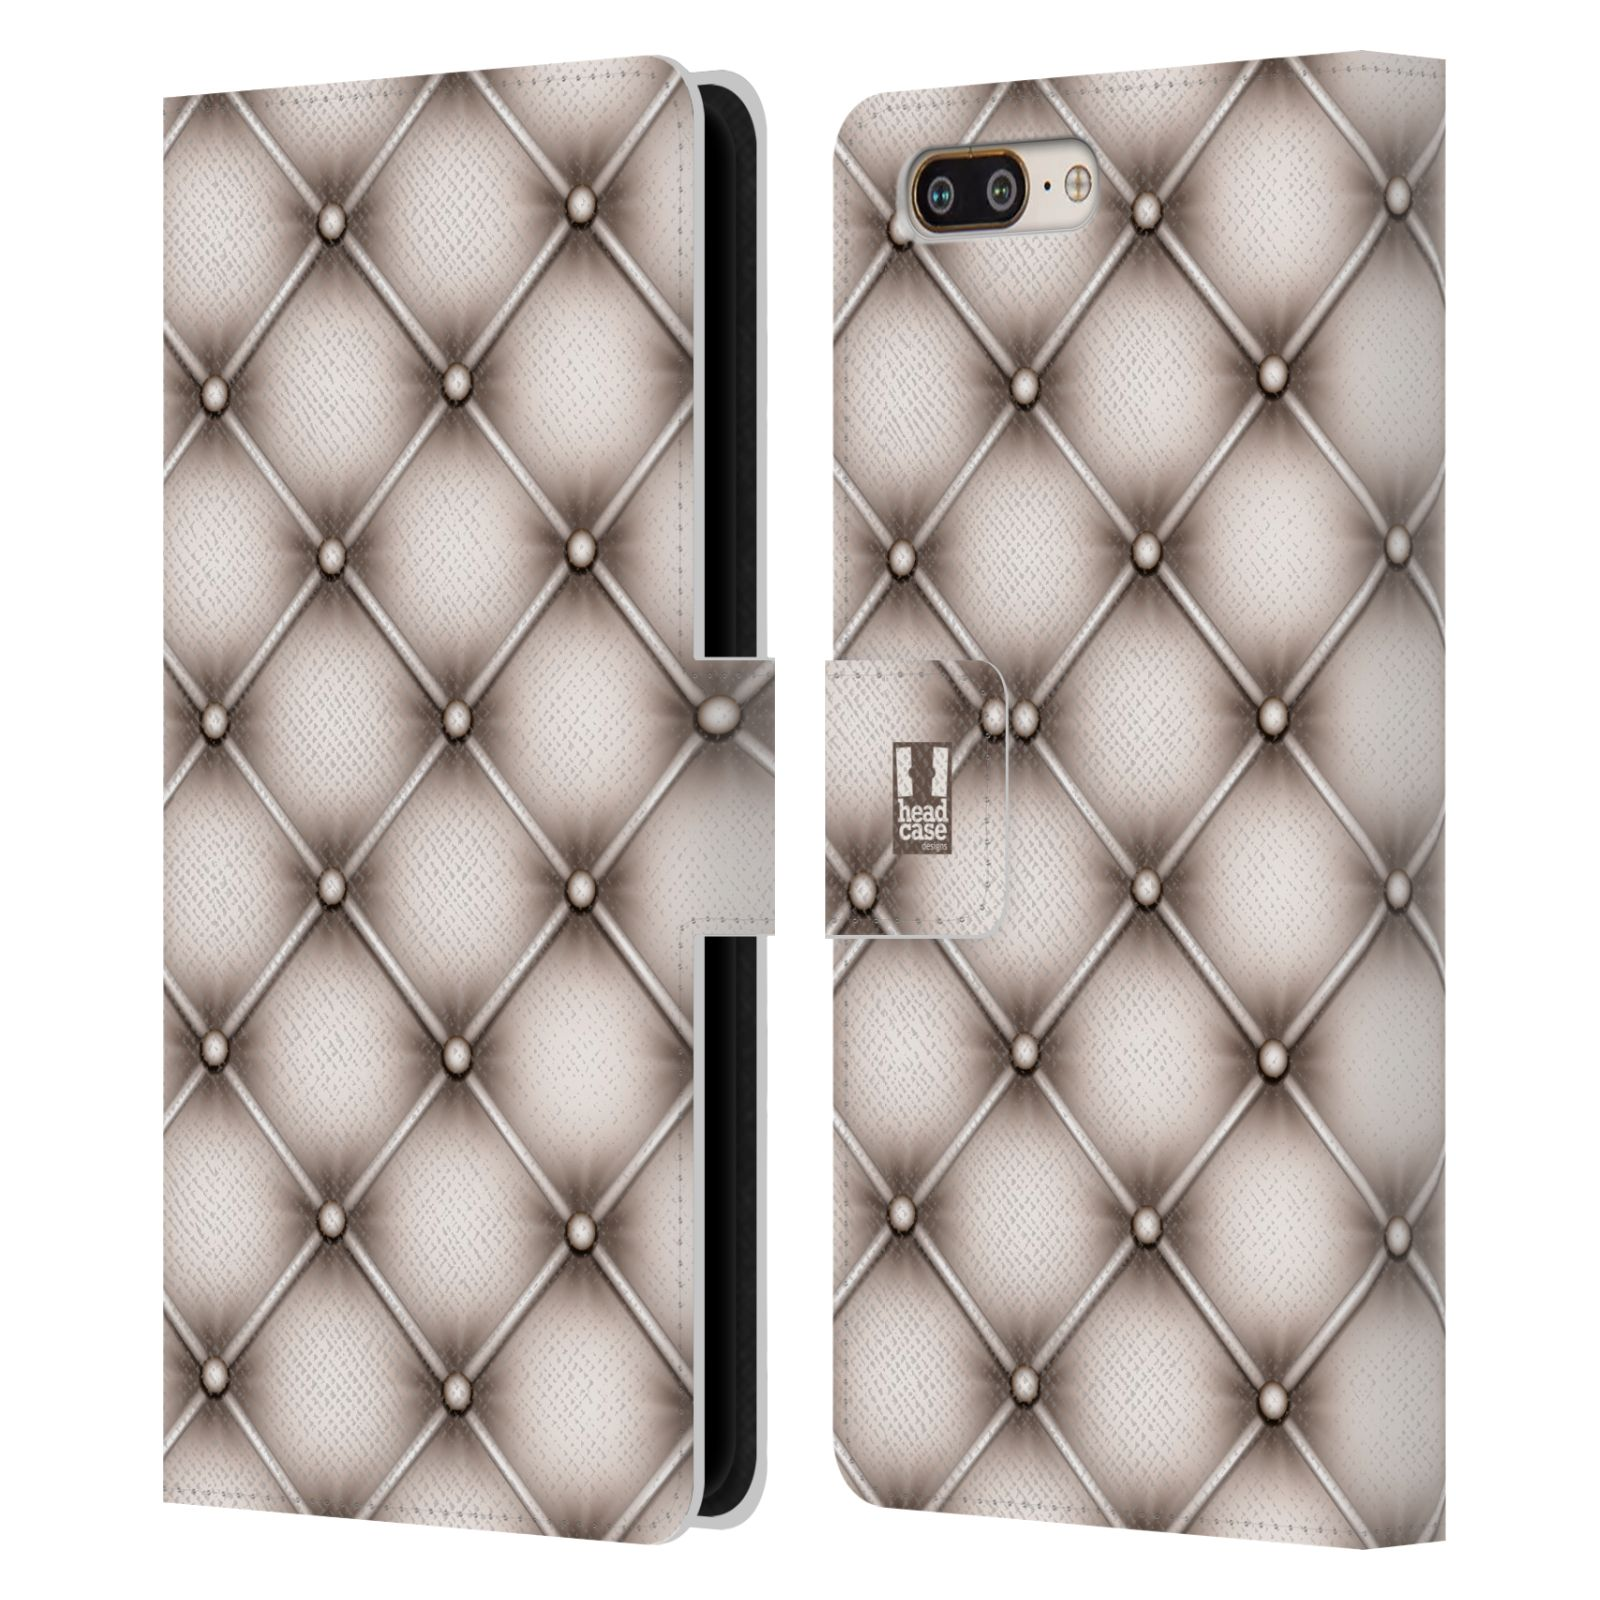 head case designs kissen brieftasche handyh lle aus leder. Black Bedroom Furniture Sets. Home Design Ideas